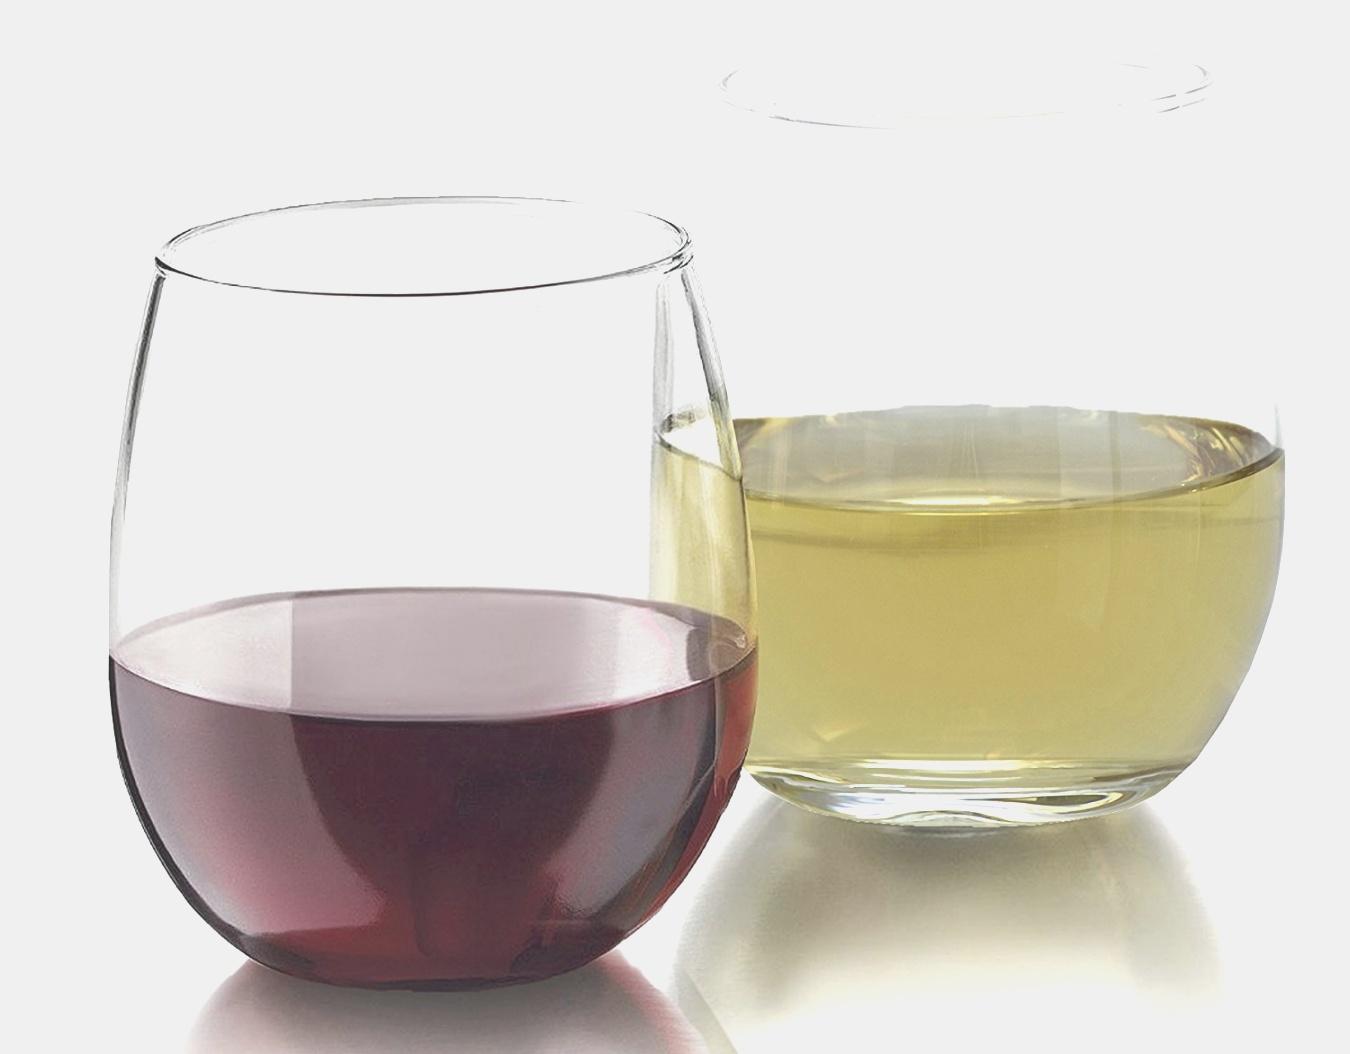 glass set  | Artland Fizzy Highball Drinking Glasses - Set of 4 | Everything ..